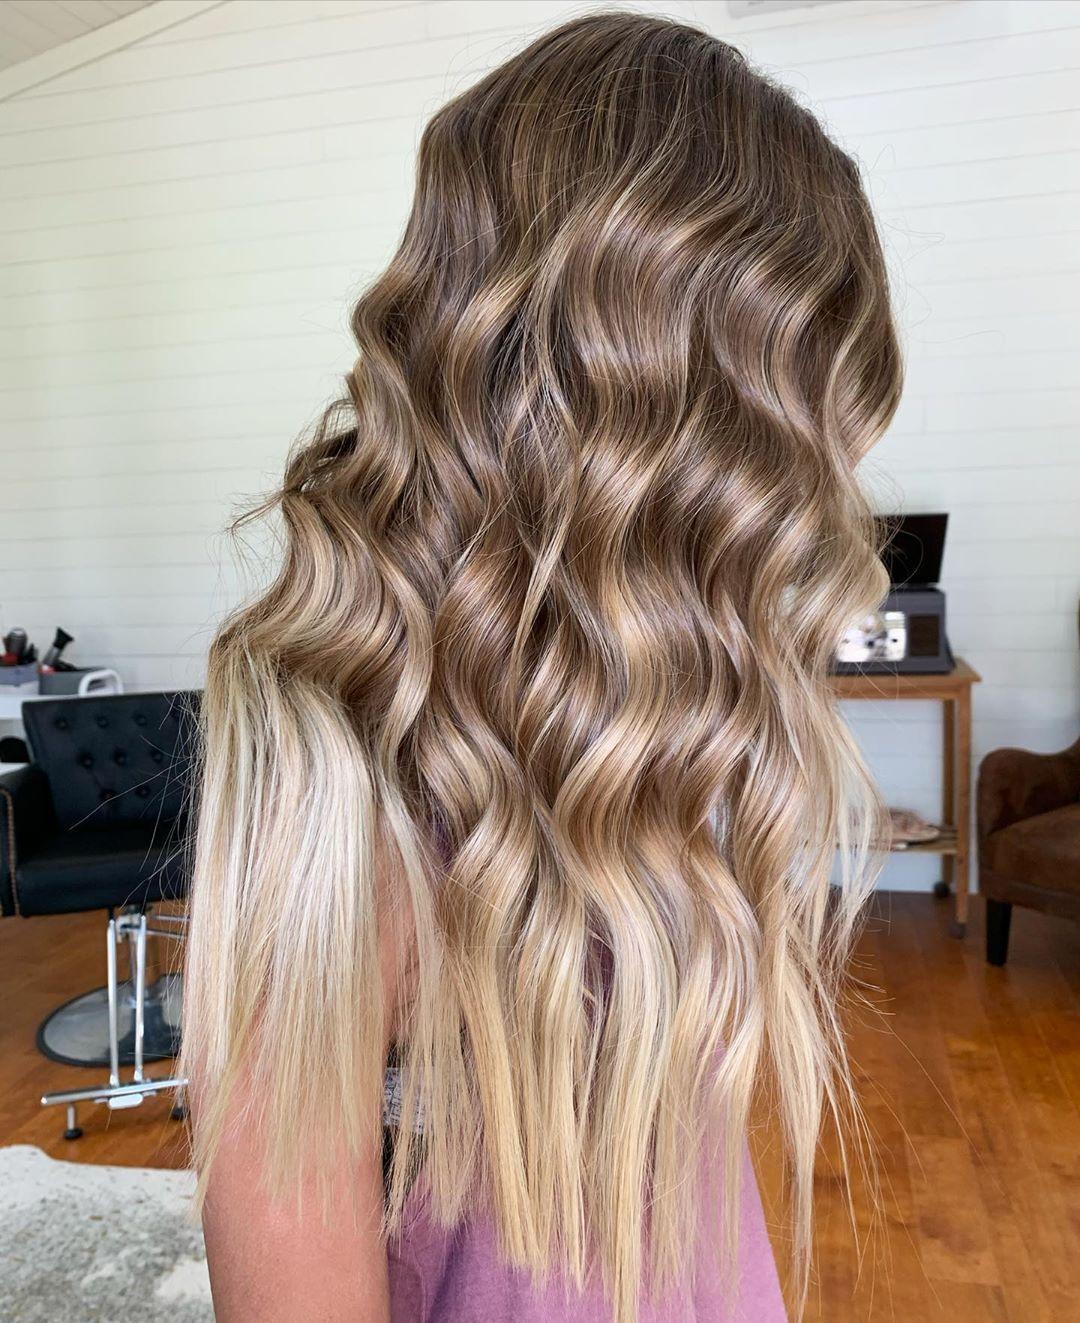 Lafayette La Hair Stylist On Instagram Happy Saturday Toned With Redken Shadeseq 9p 000 Shadeseqgloss Shadeseqformulas In 2020 Hair Stylist Hair Redken